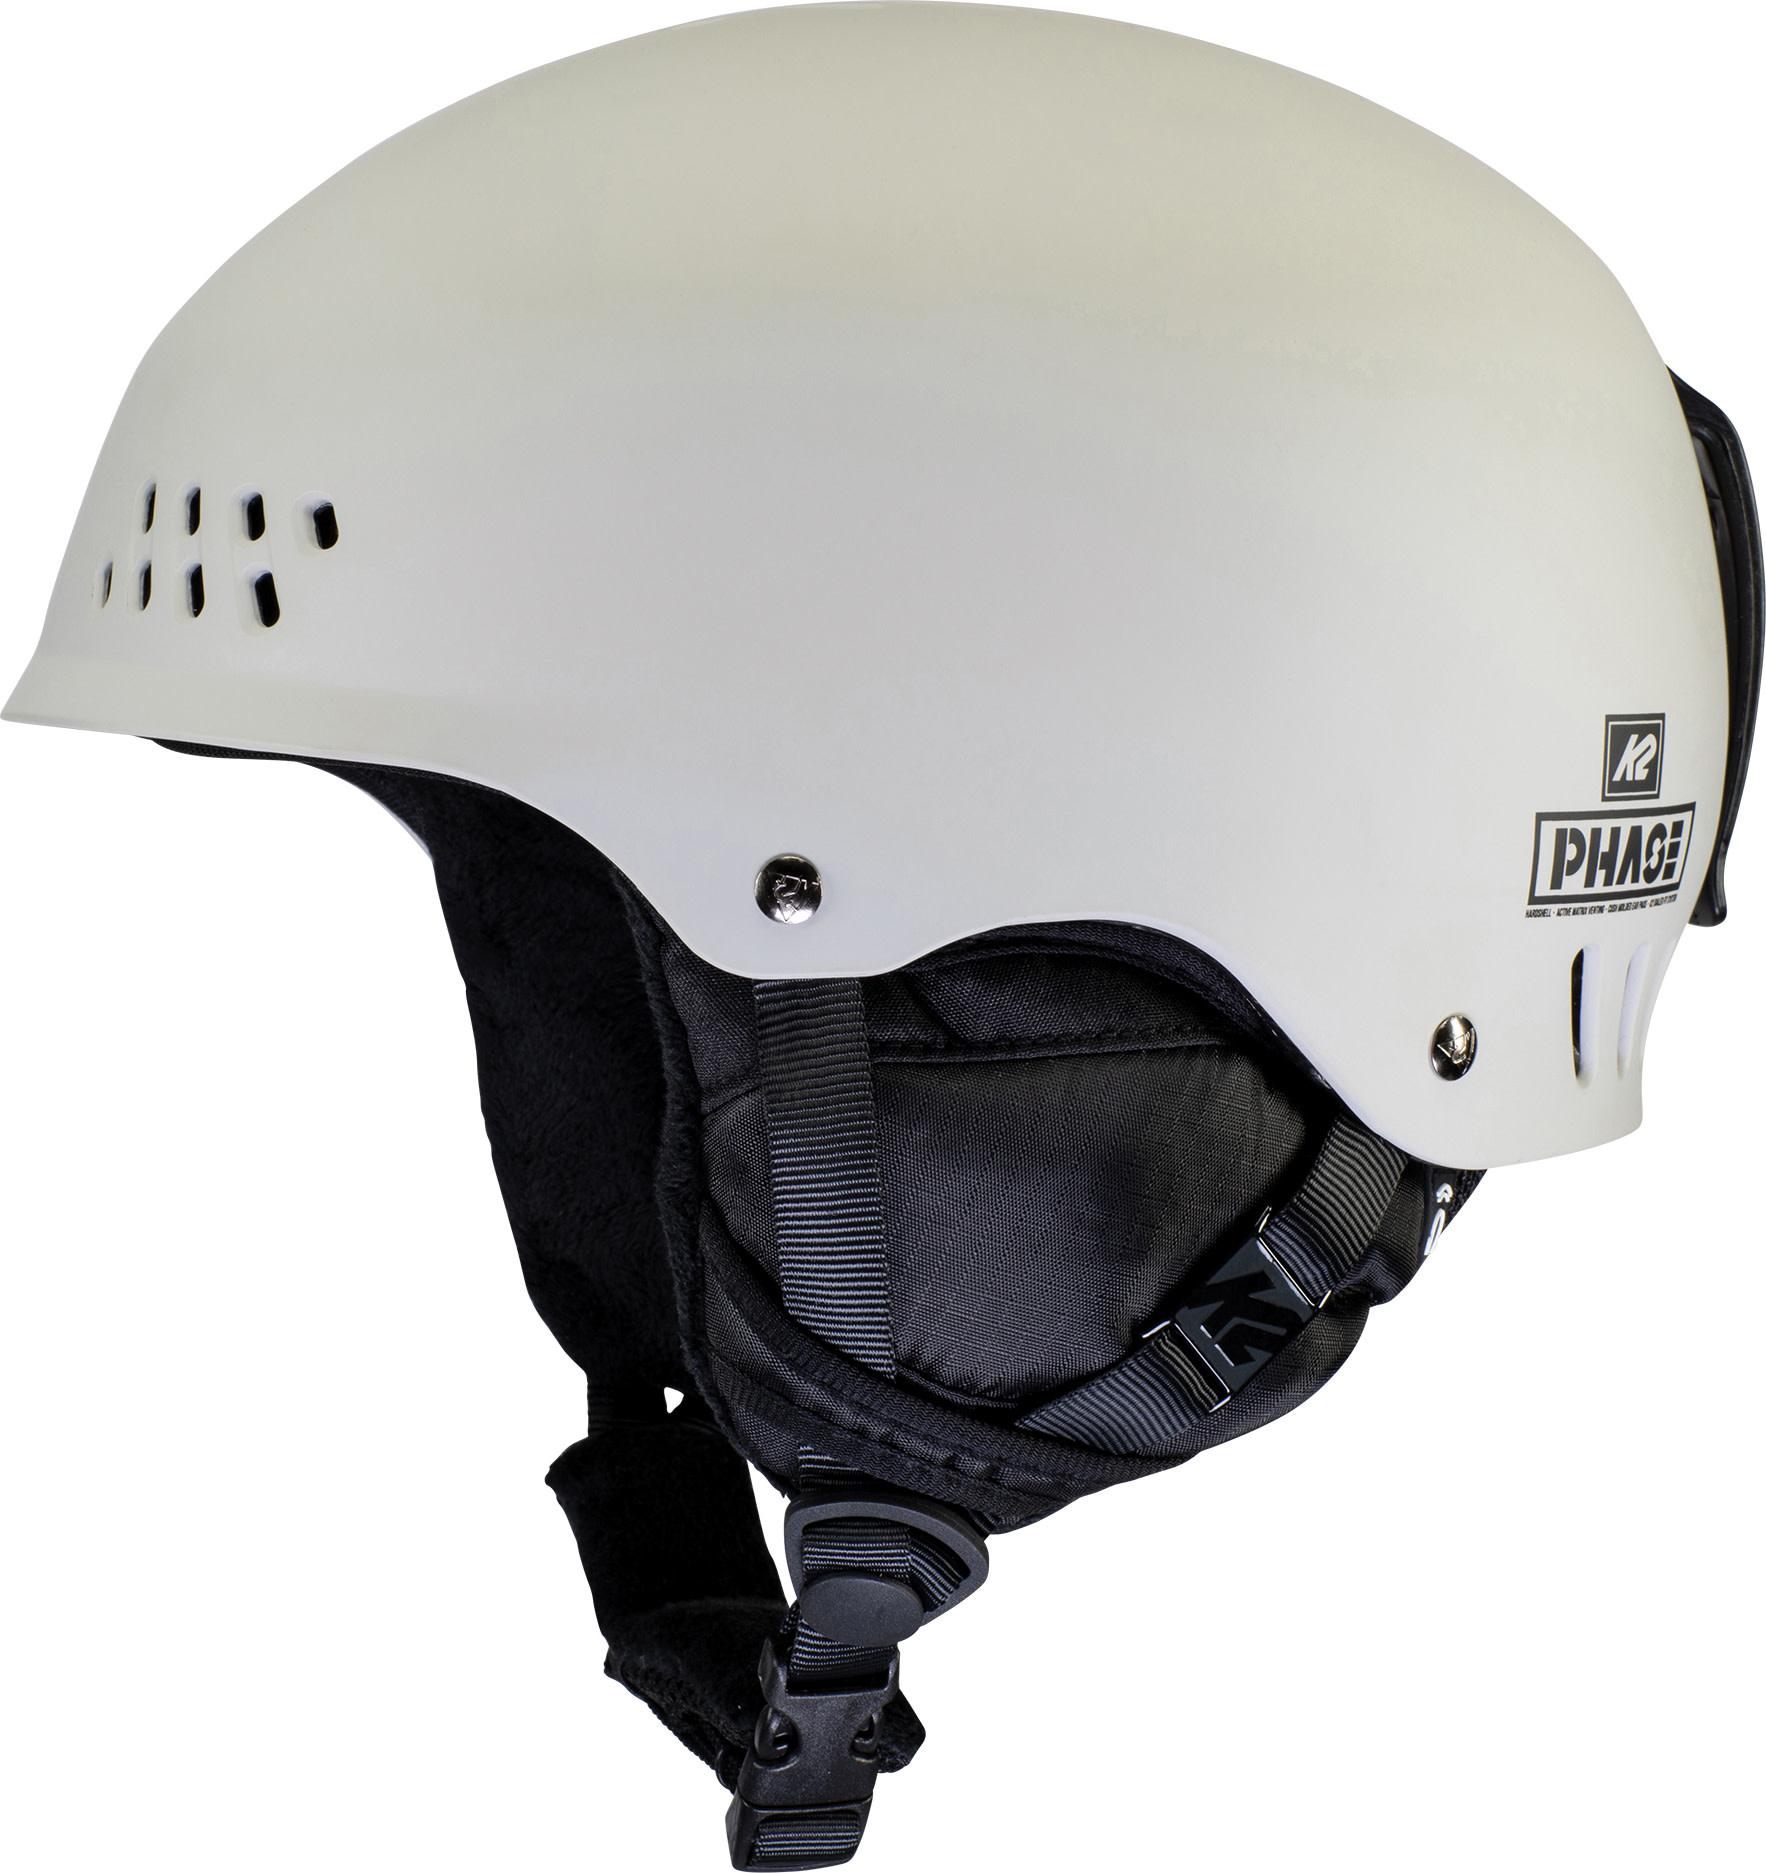 K2 K2 Phase Pro Snow Helmet